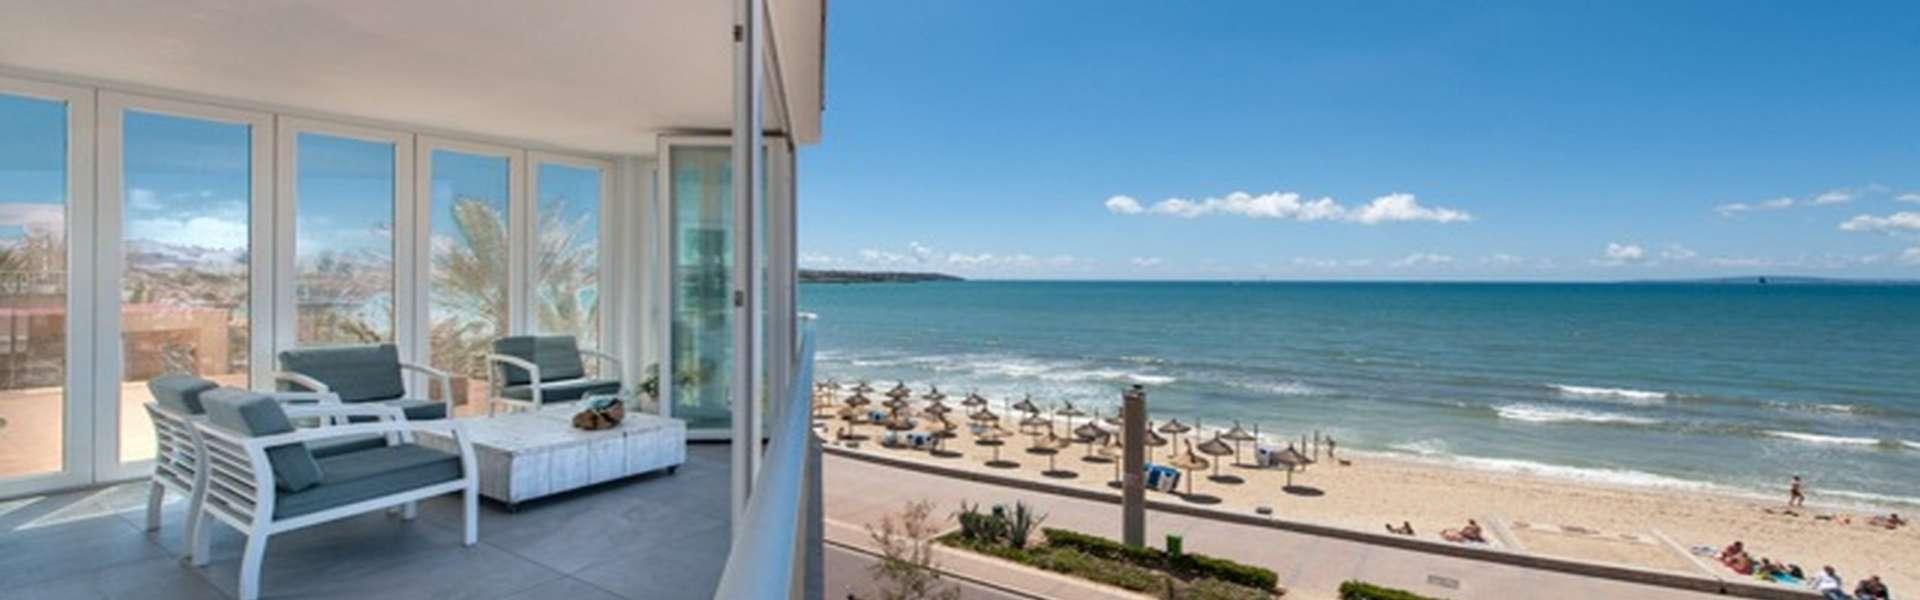 Palma - Luxusapartment in erster Meereslinie